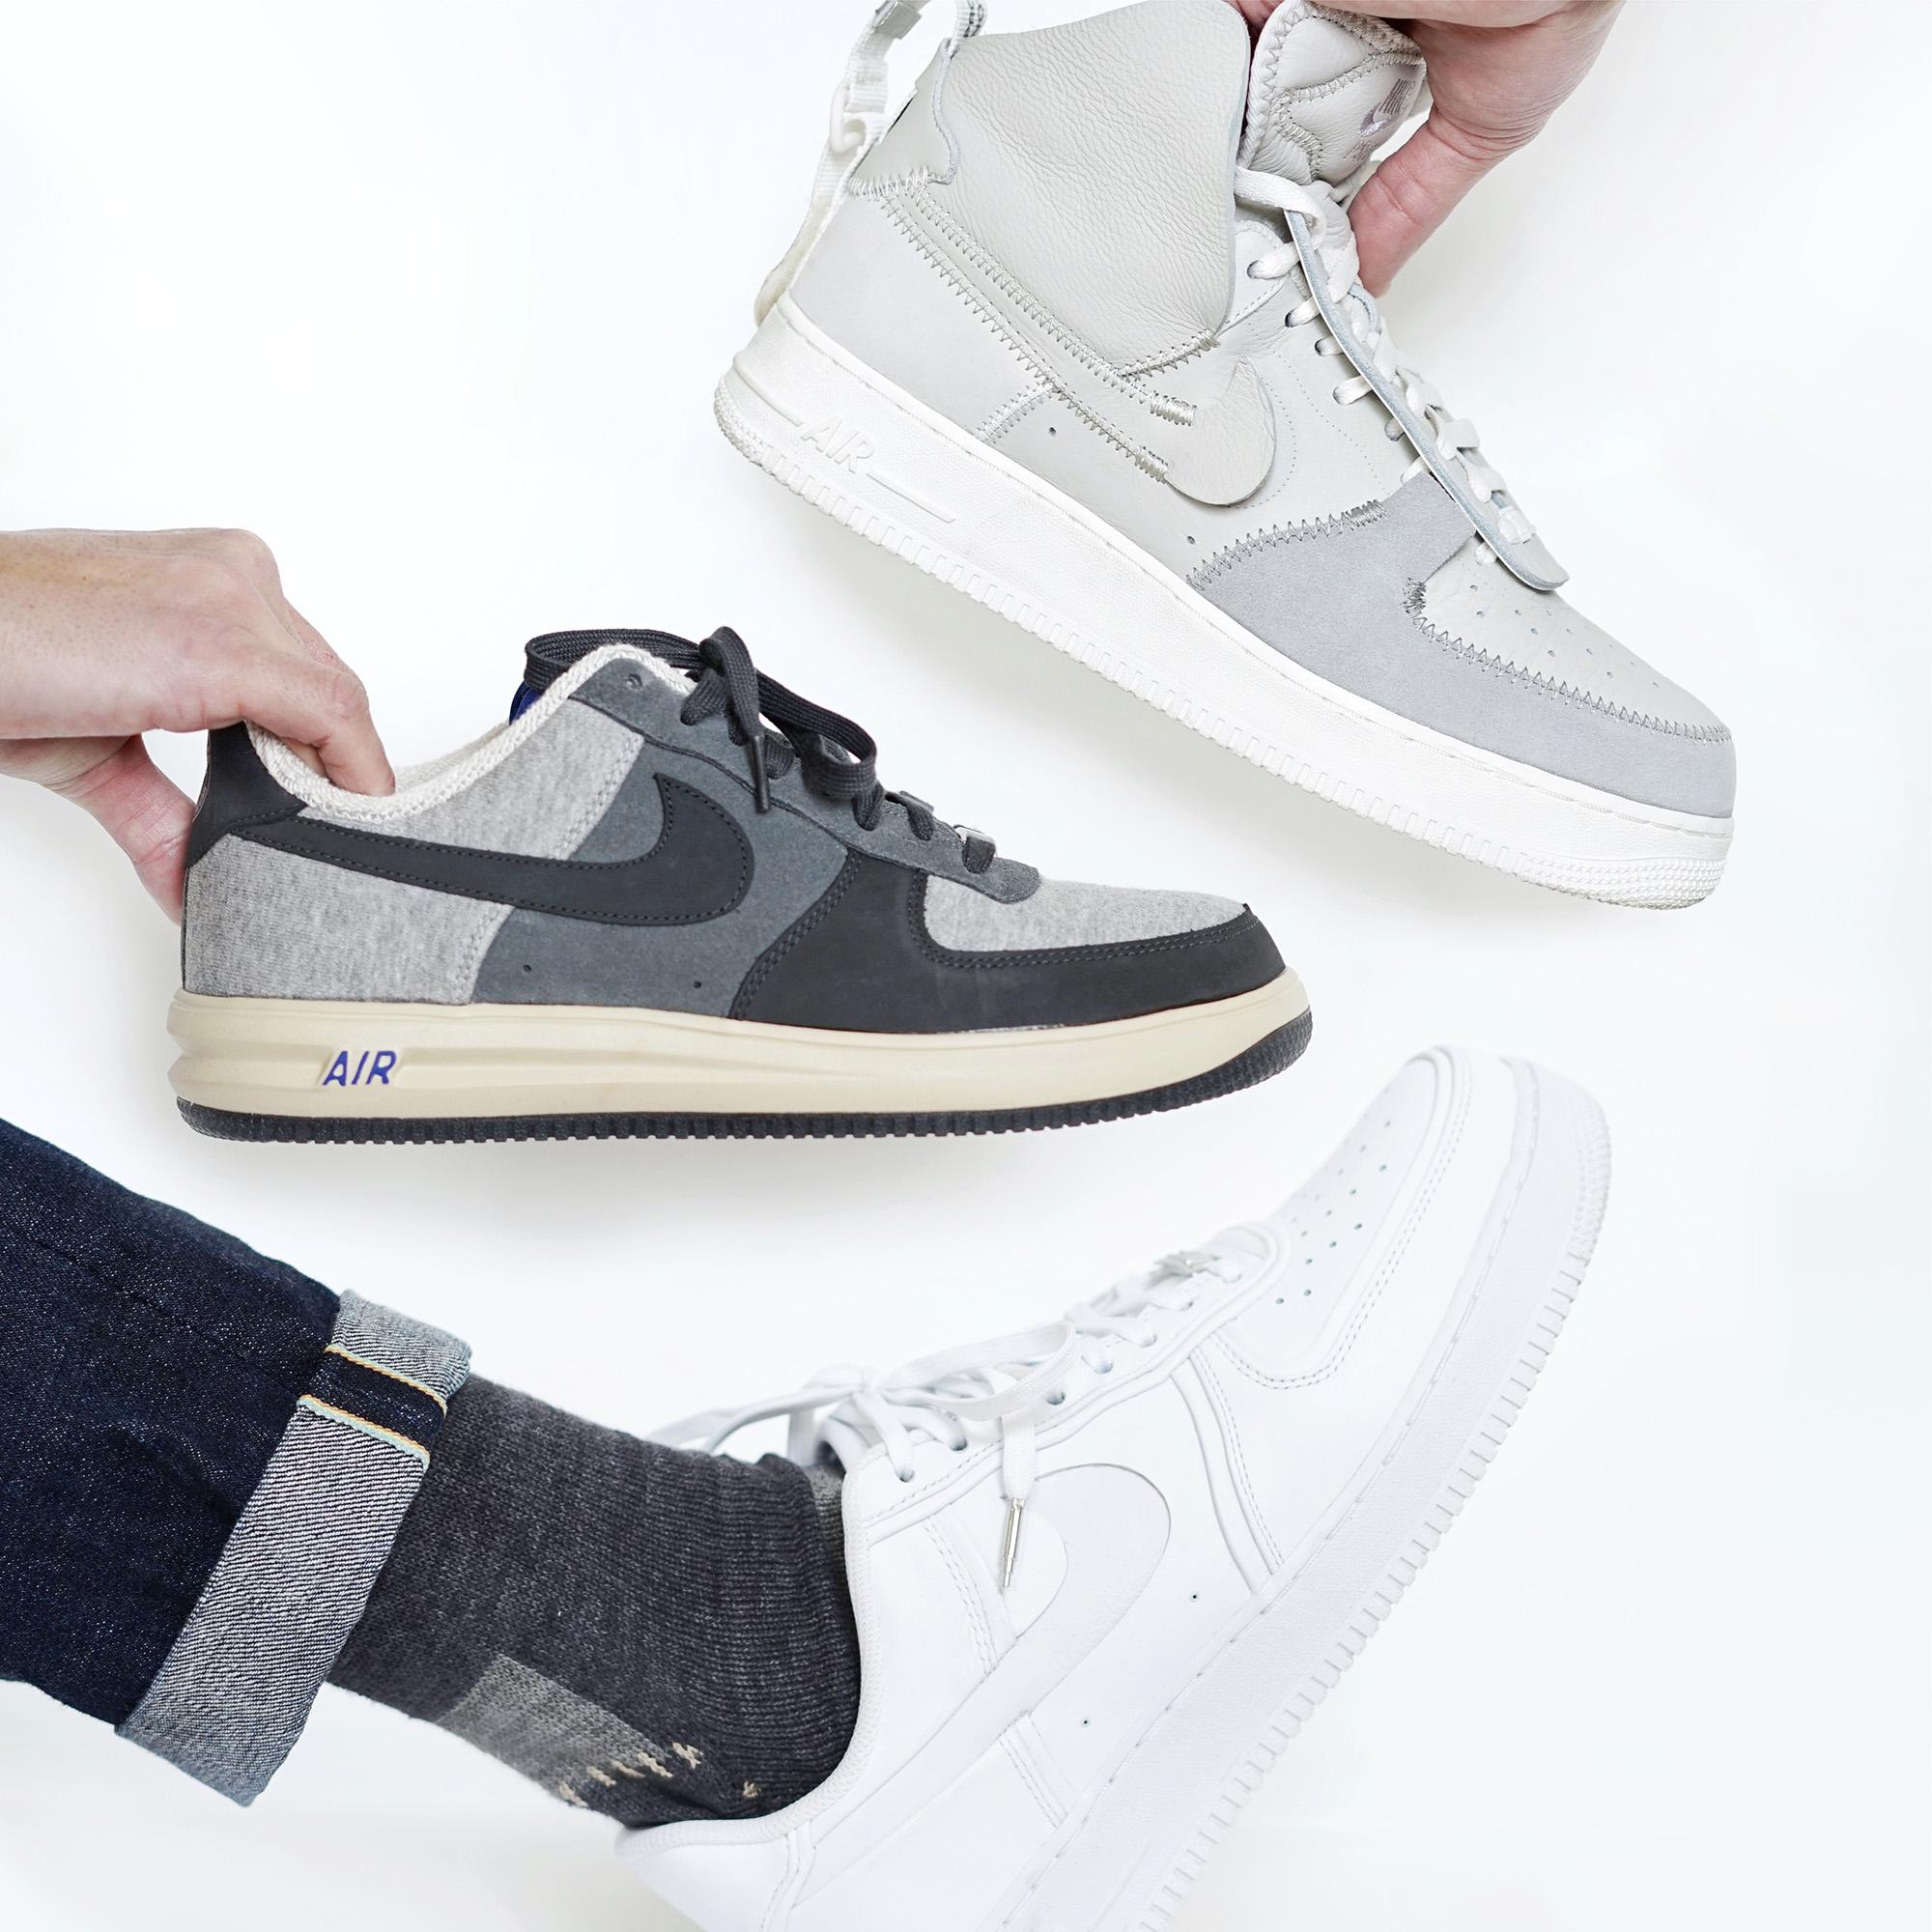 1 Les Nike ModèlesJo 10 Force Air Beaux Top Plus Yana zUVqSMp